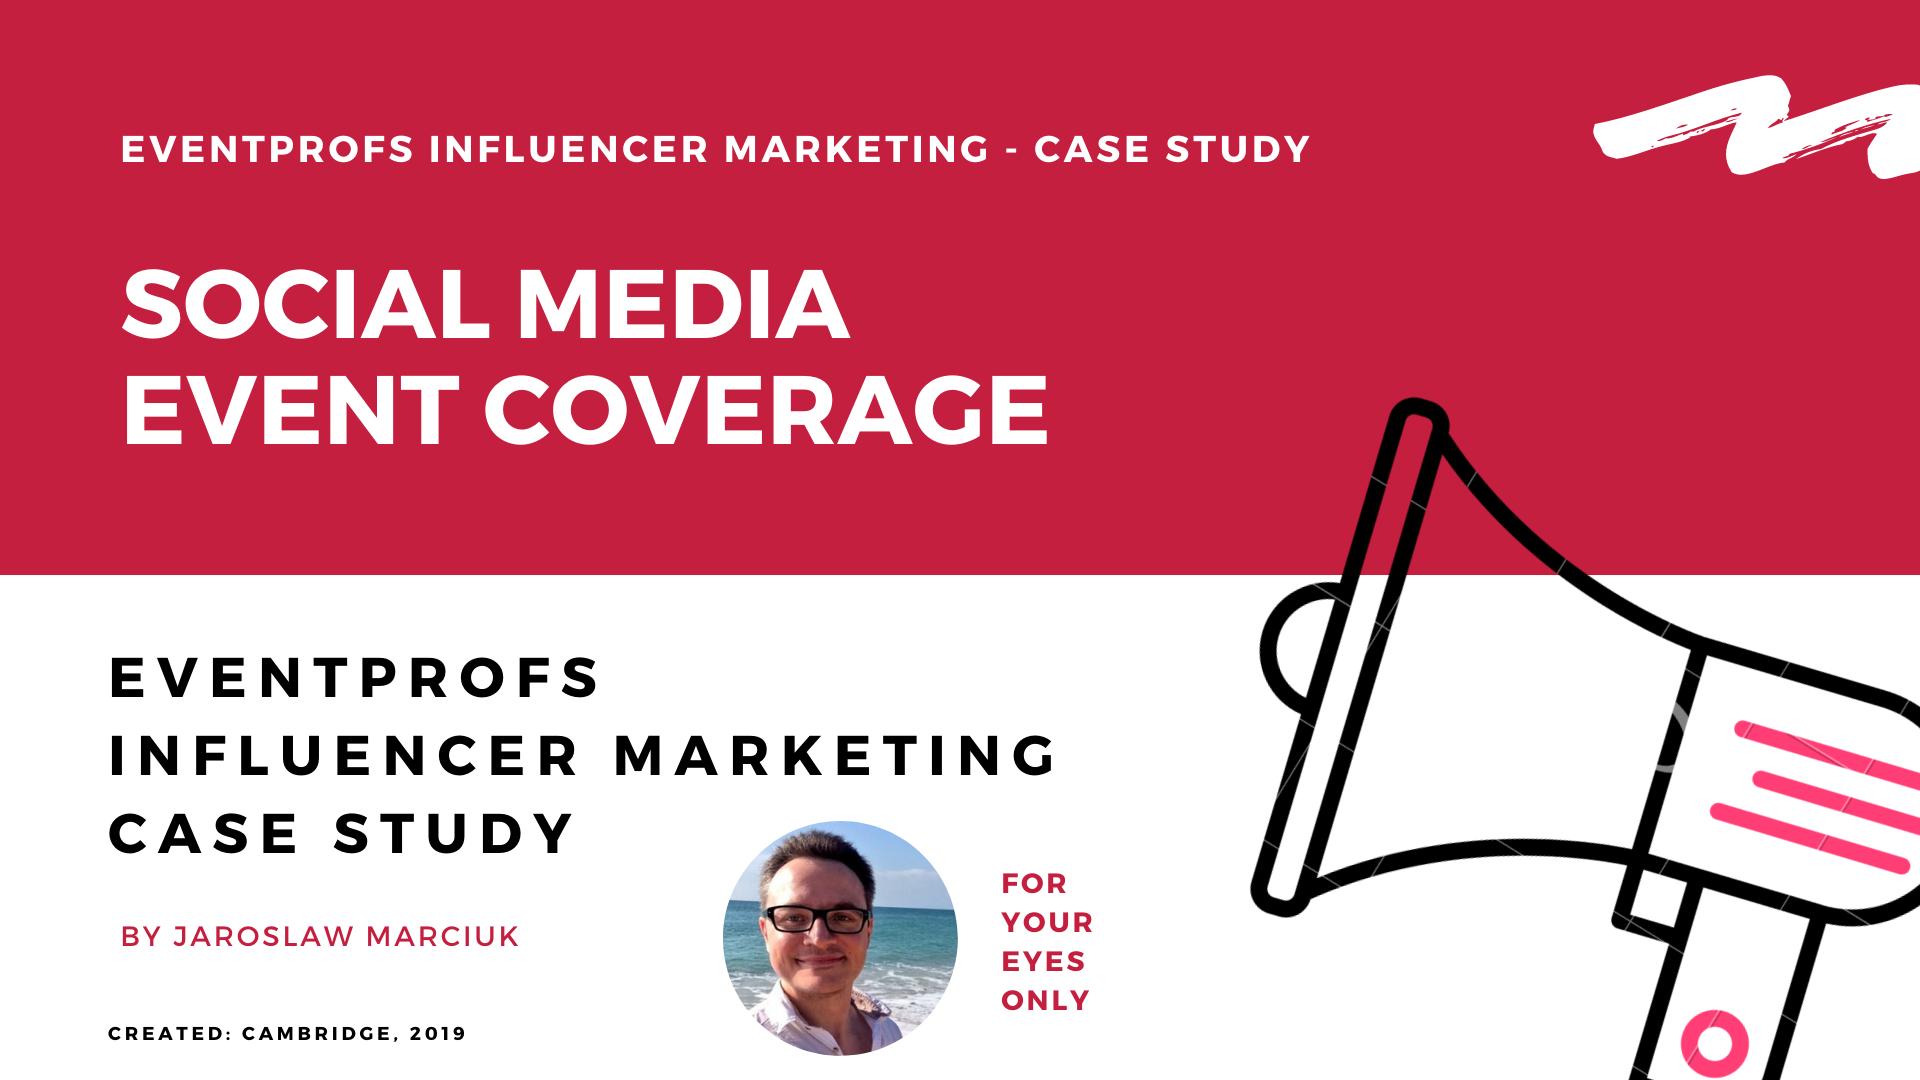 MICE influencer marketing case study